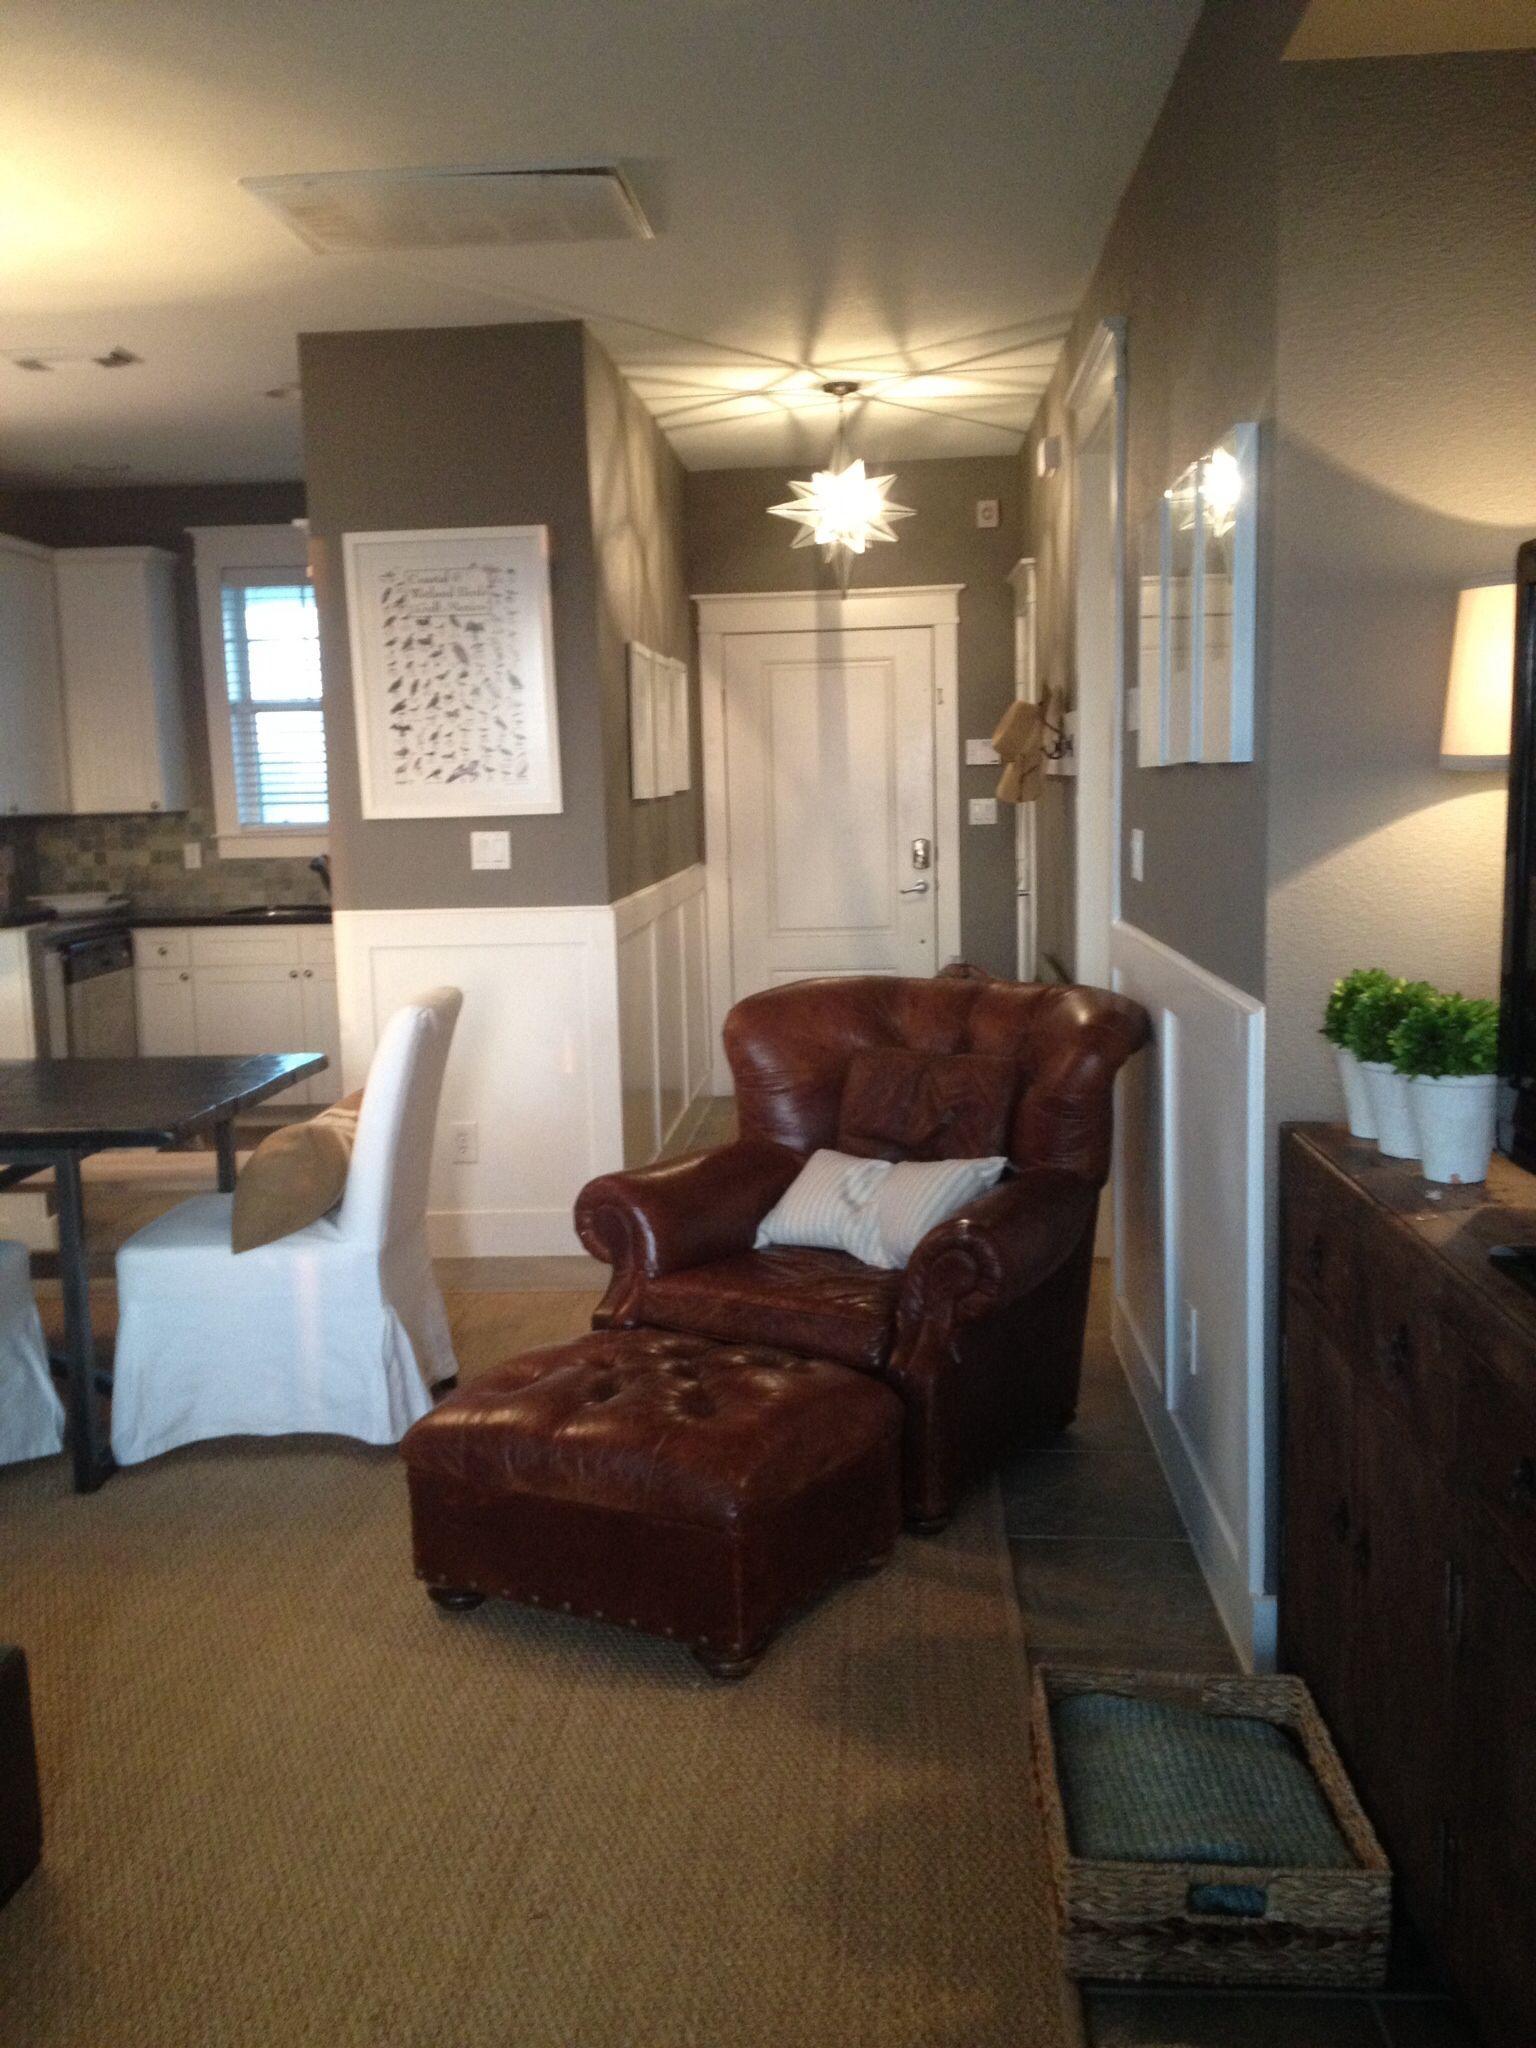 Restoration Hardware Furniture Slate Paint Seagr High Fashion Home Houston